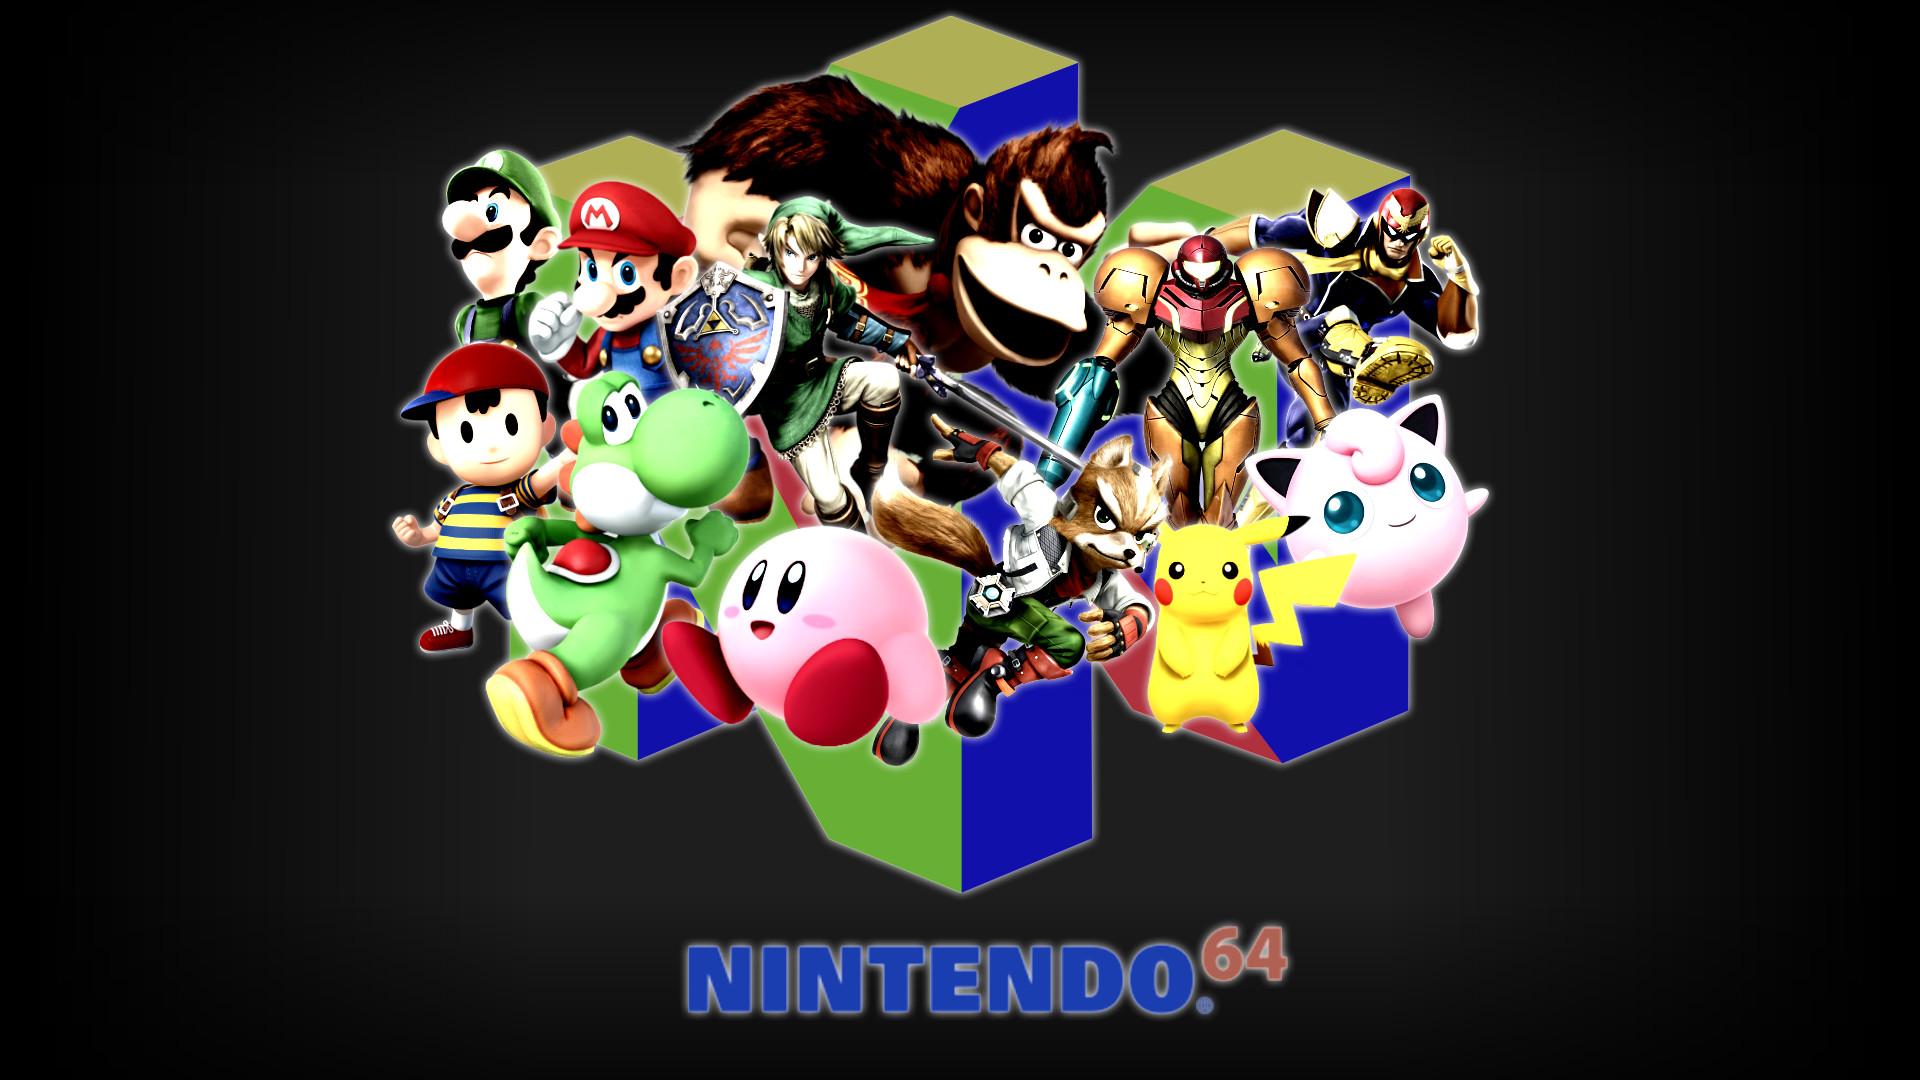 Nintendo 64 Wallpapers 68 Pictures